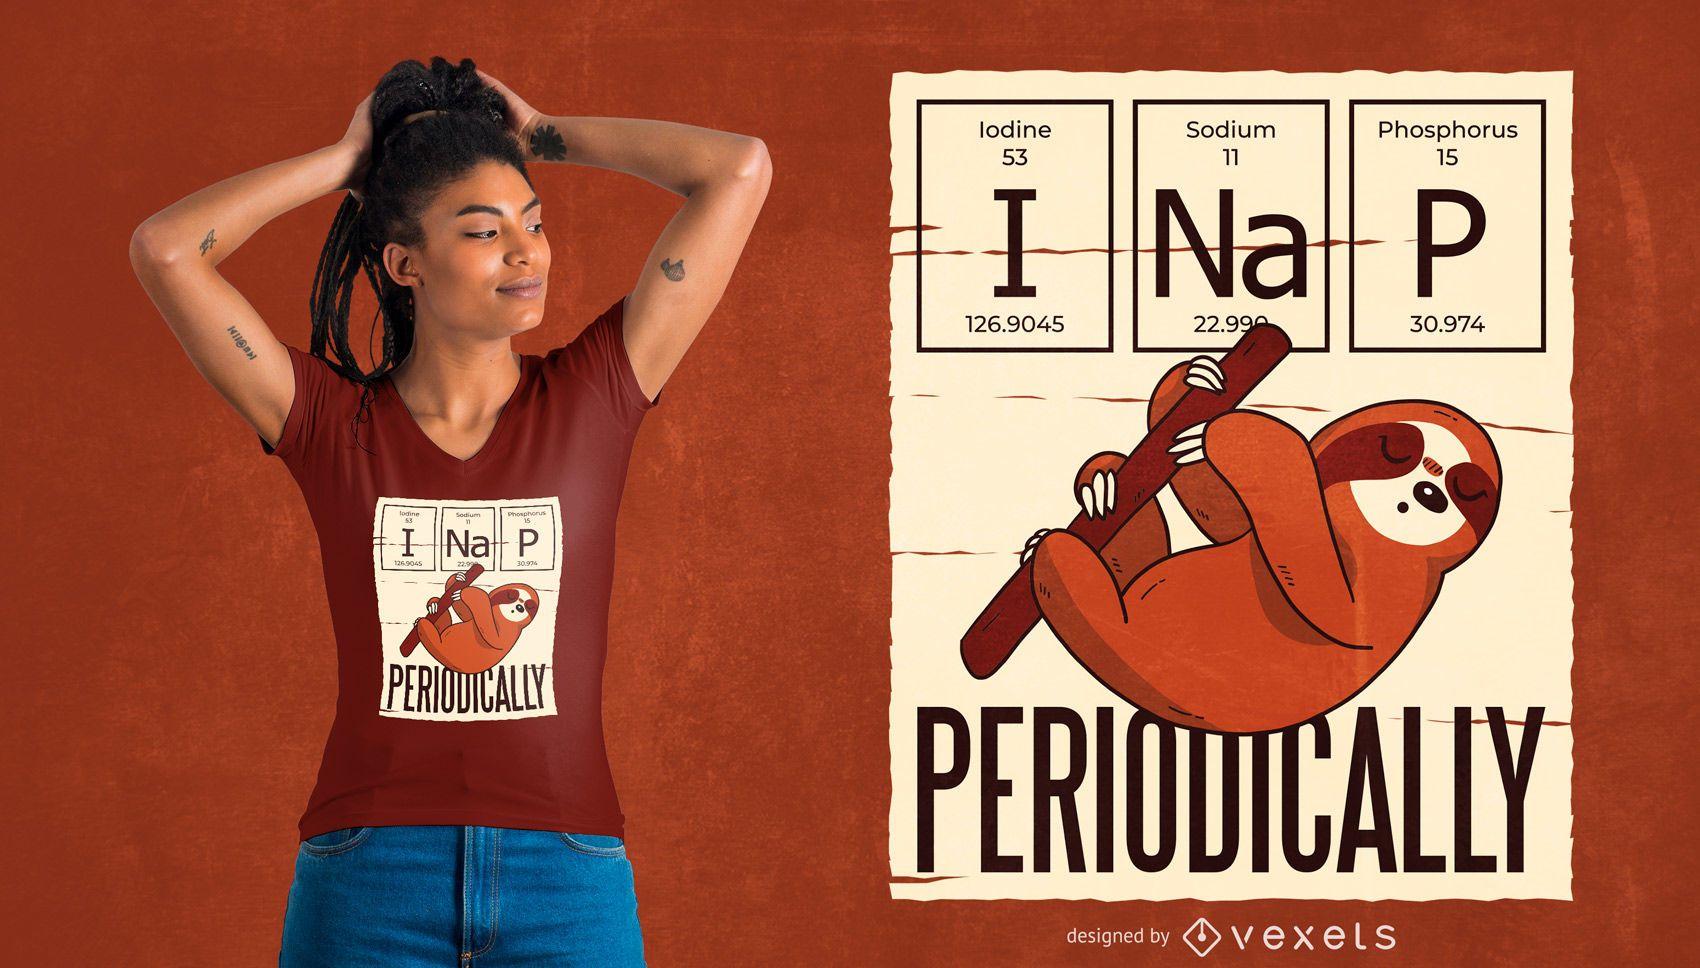 Nap periodically sloth t-shirt design